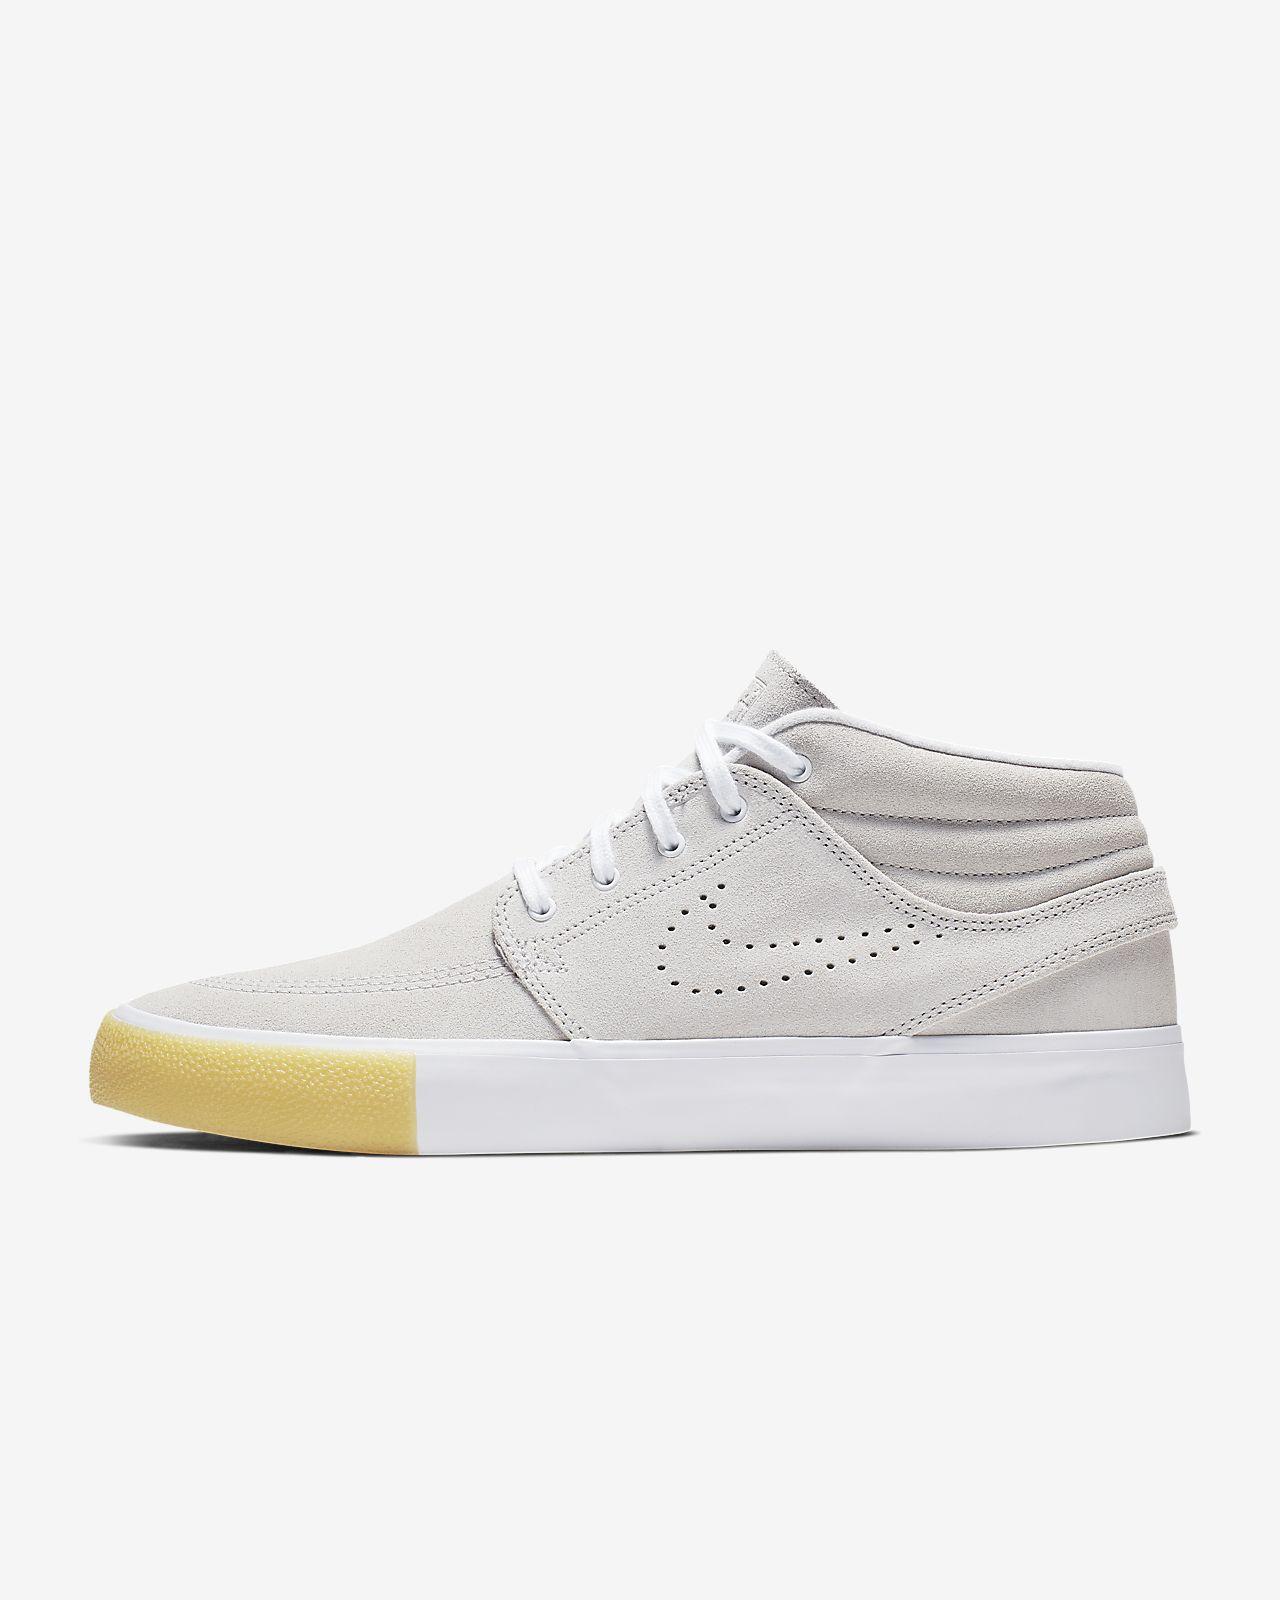 Calzado de skateboarding Nike SB Zoom Stefan Janoski Mid RM SE